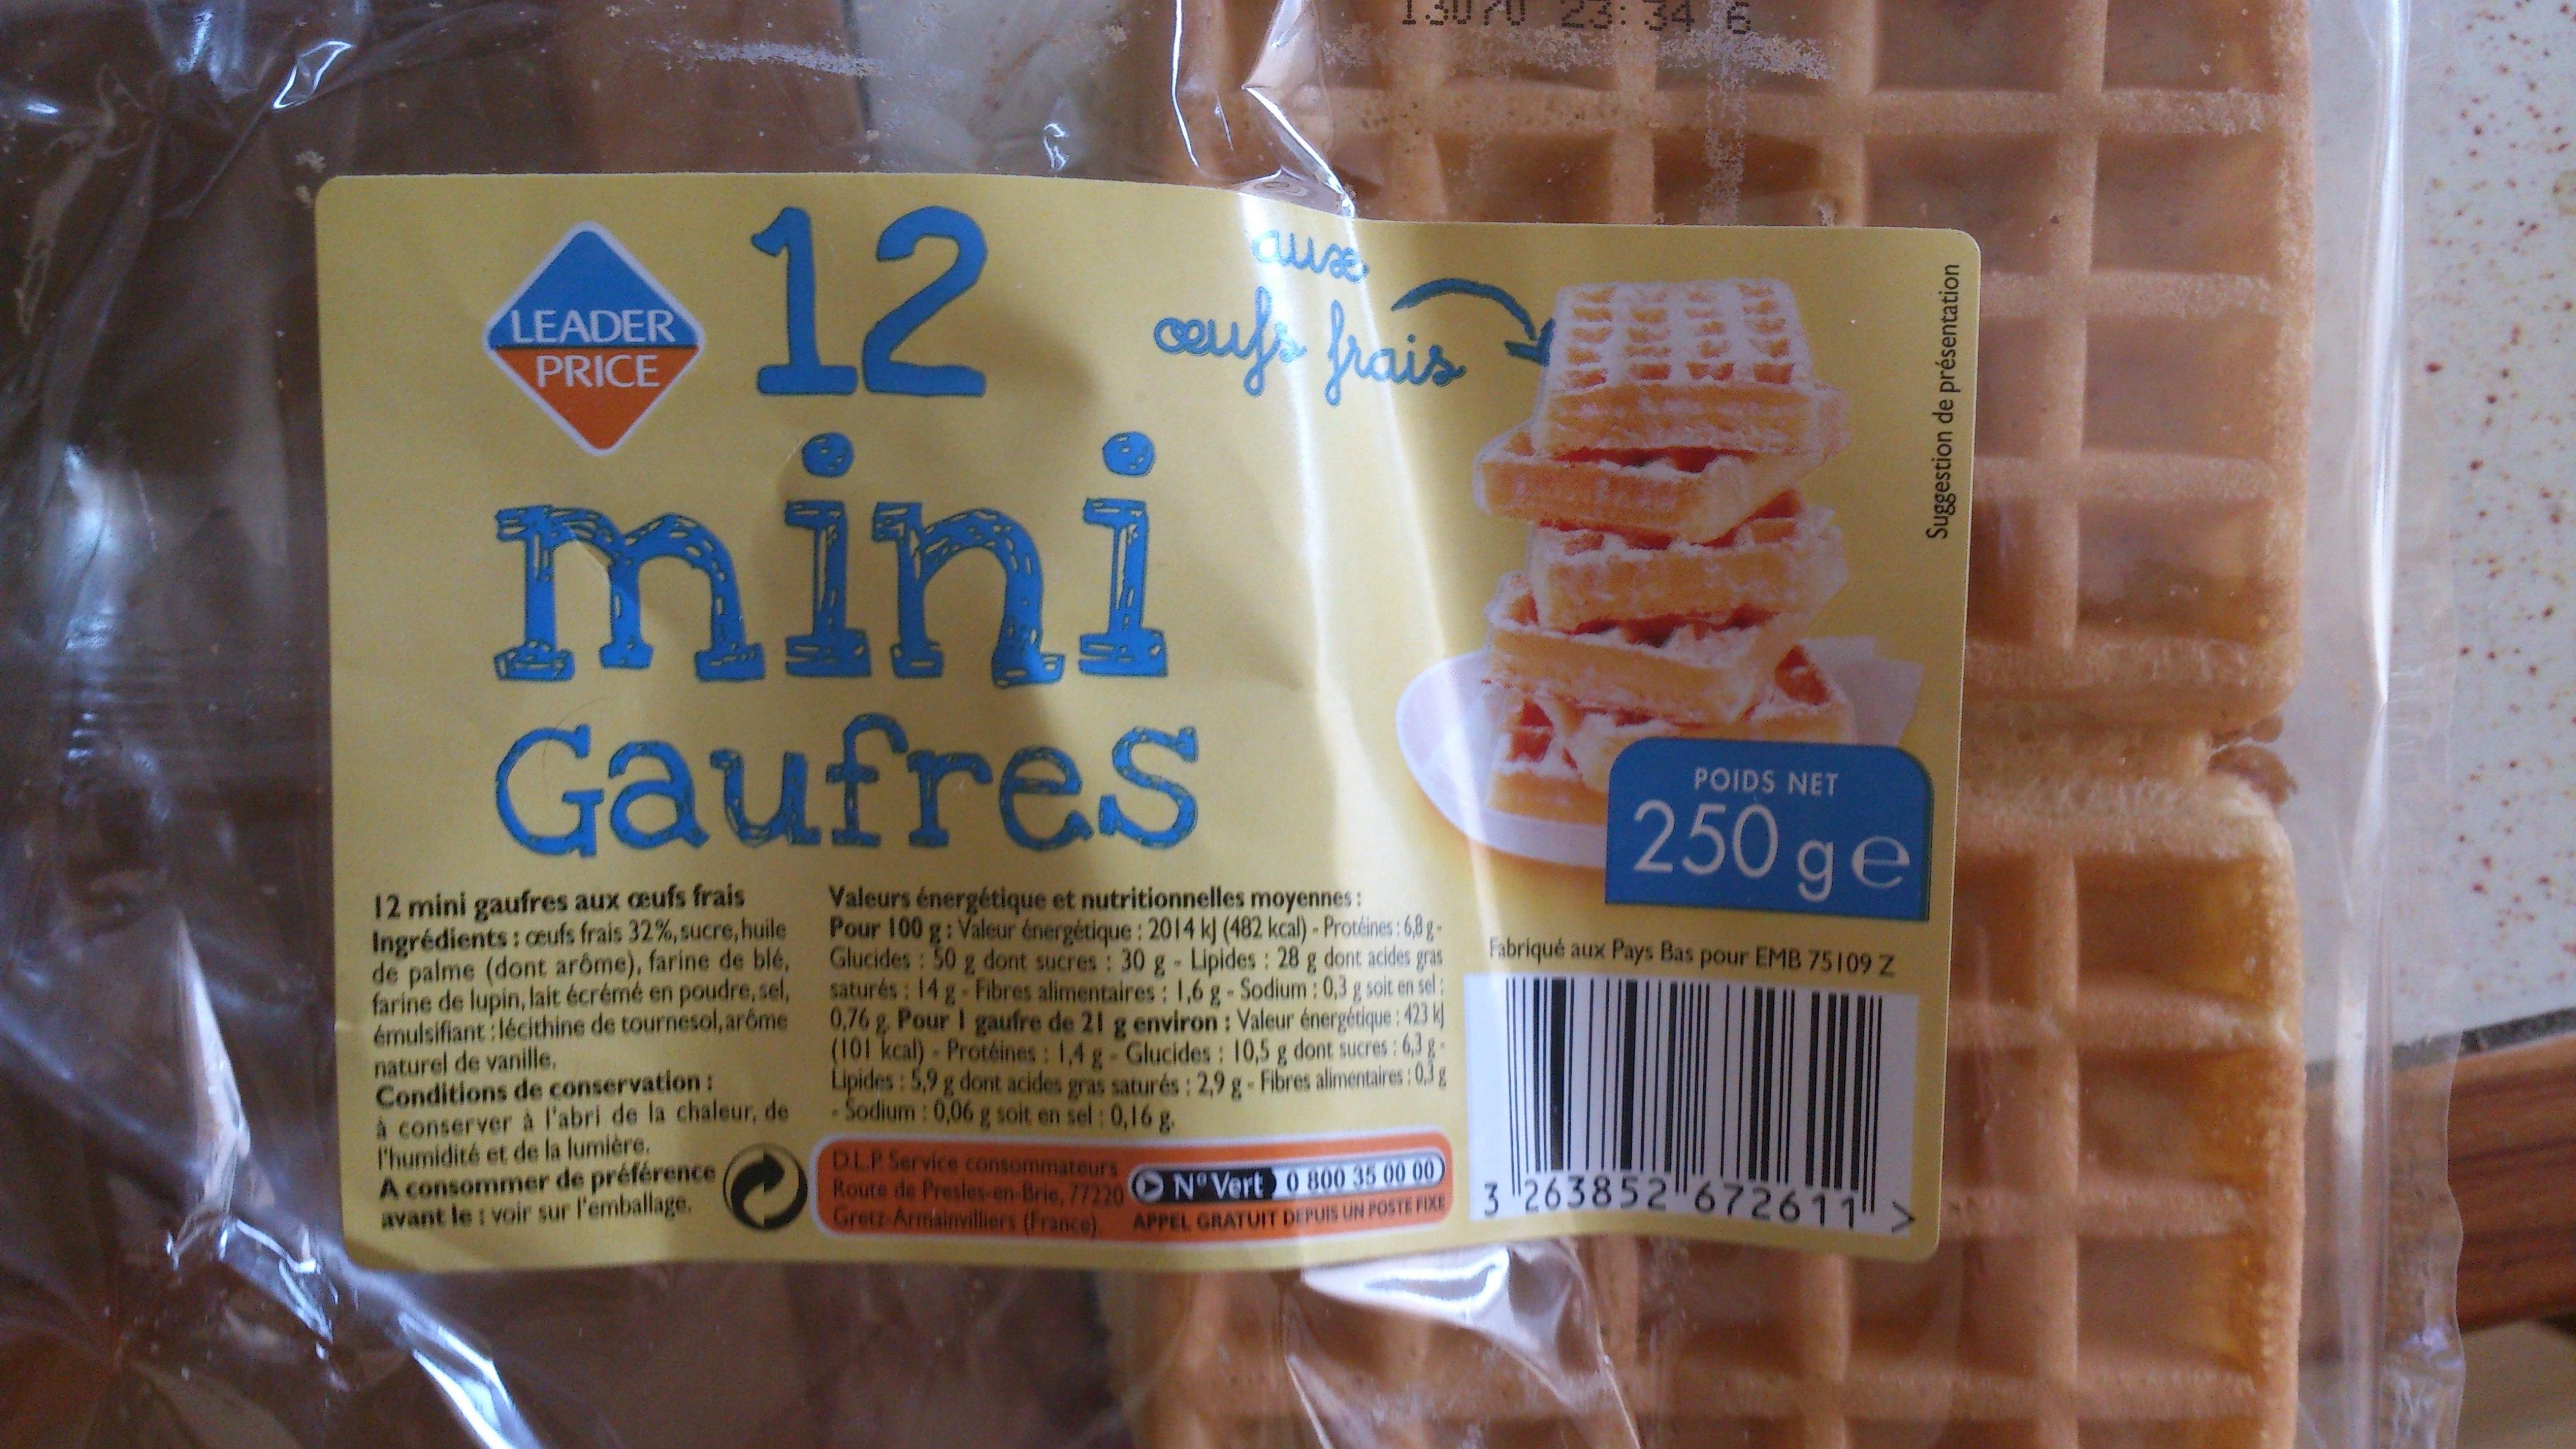 12 mini gaufres - Produit